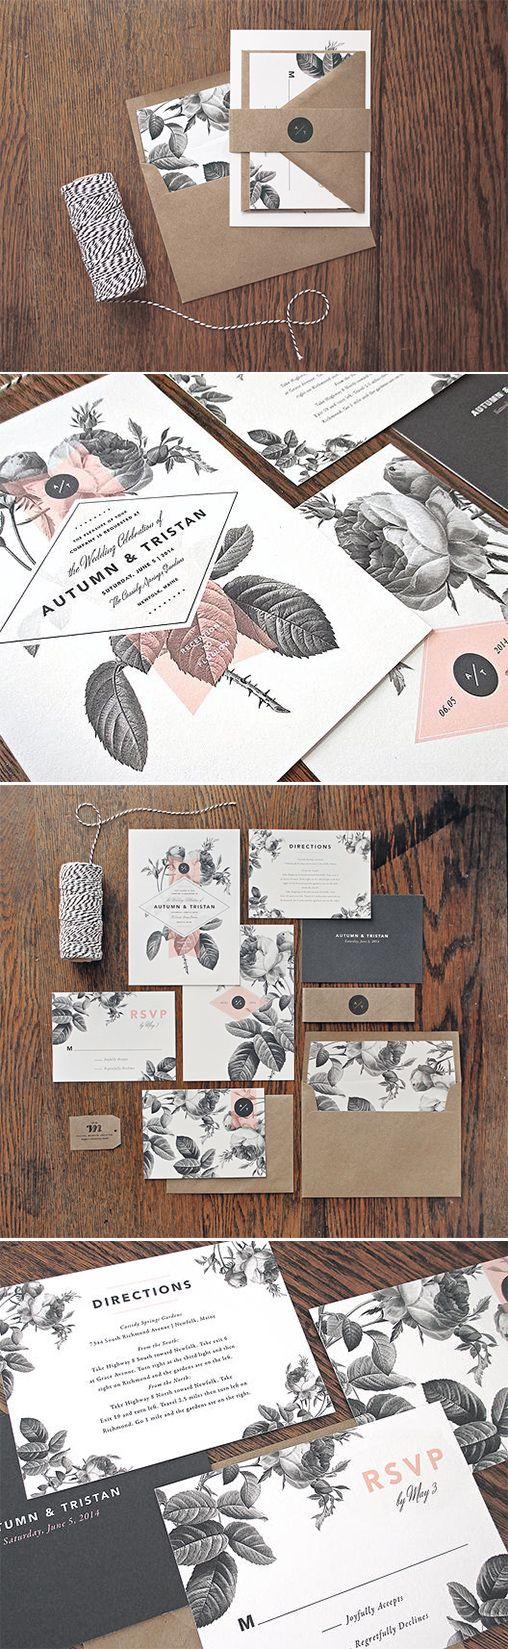 floral stationery | black and white wedding | kraft paper invites | Rachel Marvin Creative | #weddingchicks